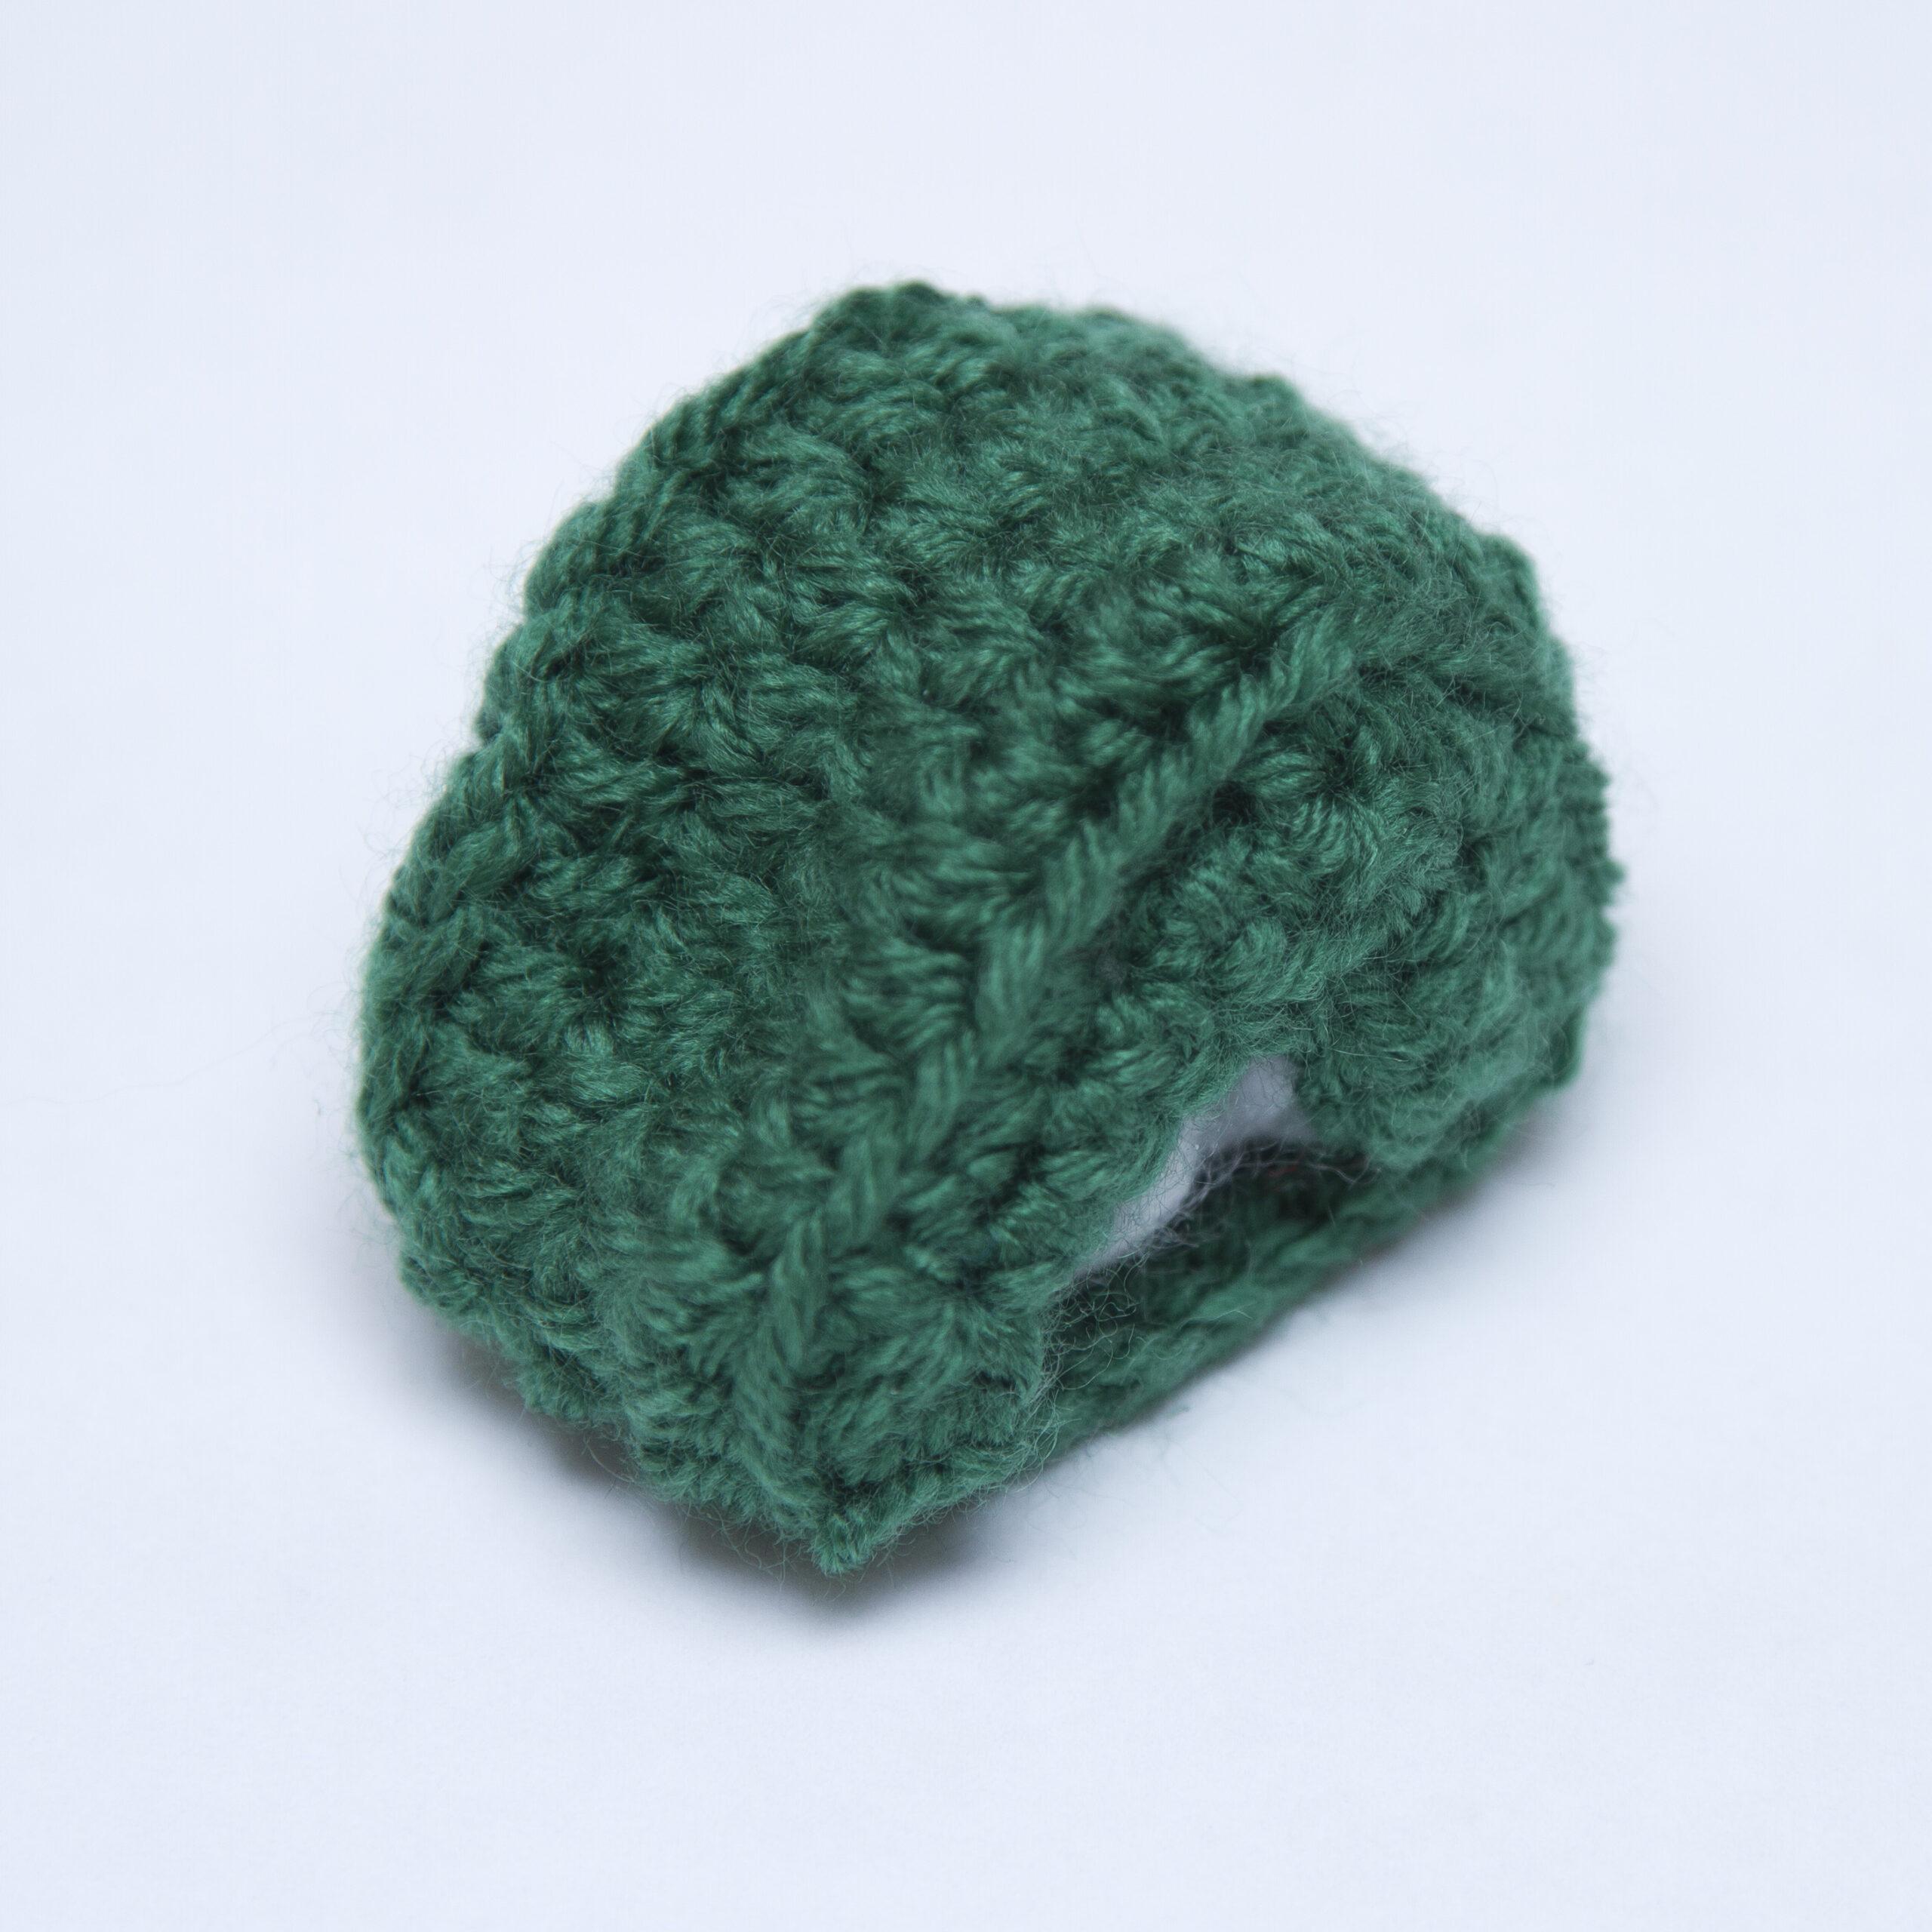 Santa's Sleigh Ornament Crochet Tutorial 5